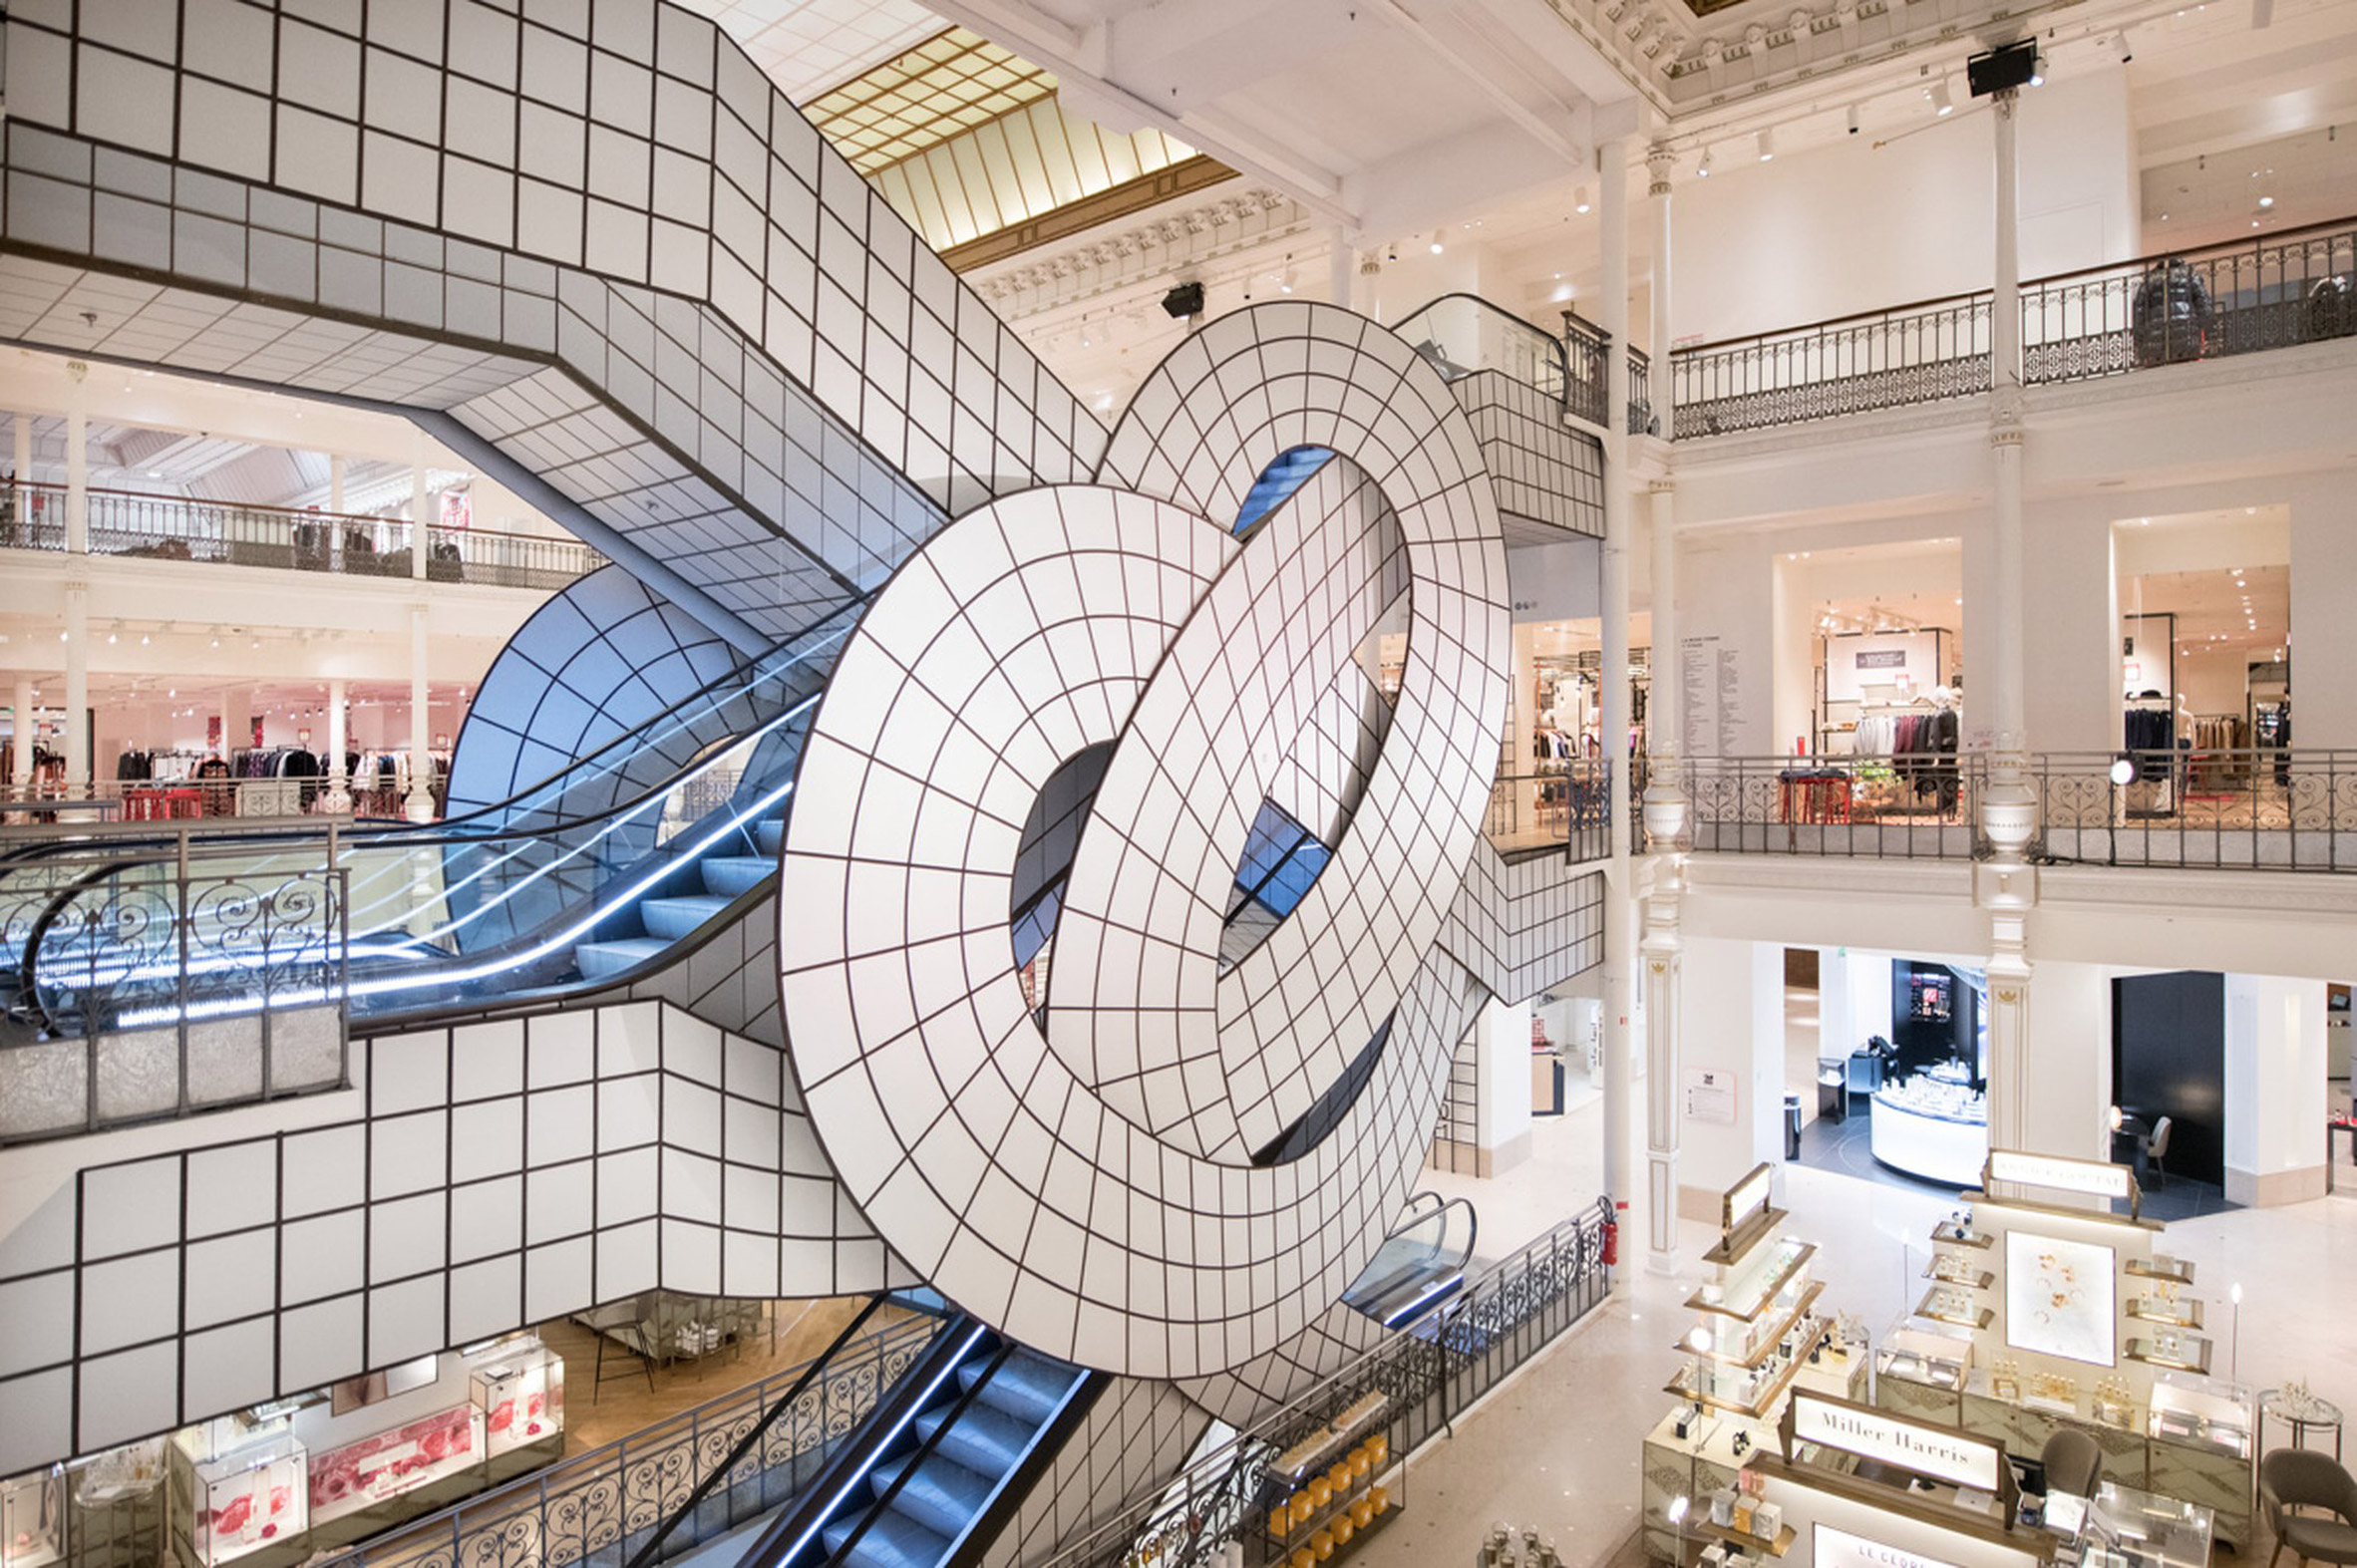 Visual Trickery into a Parisian Store